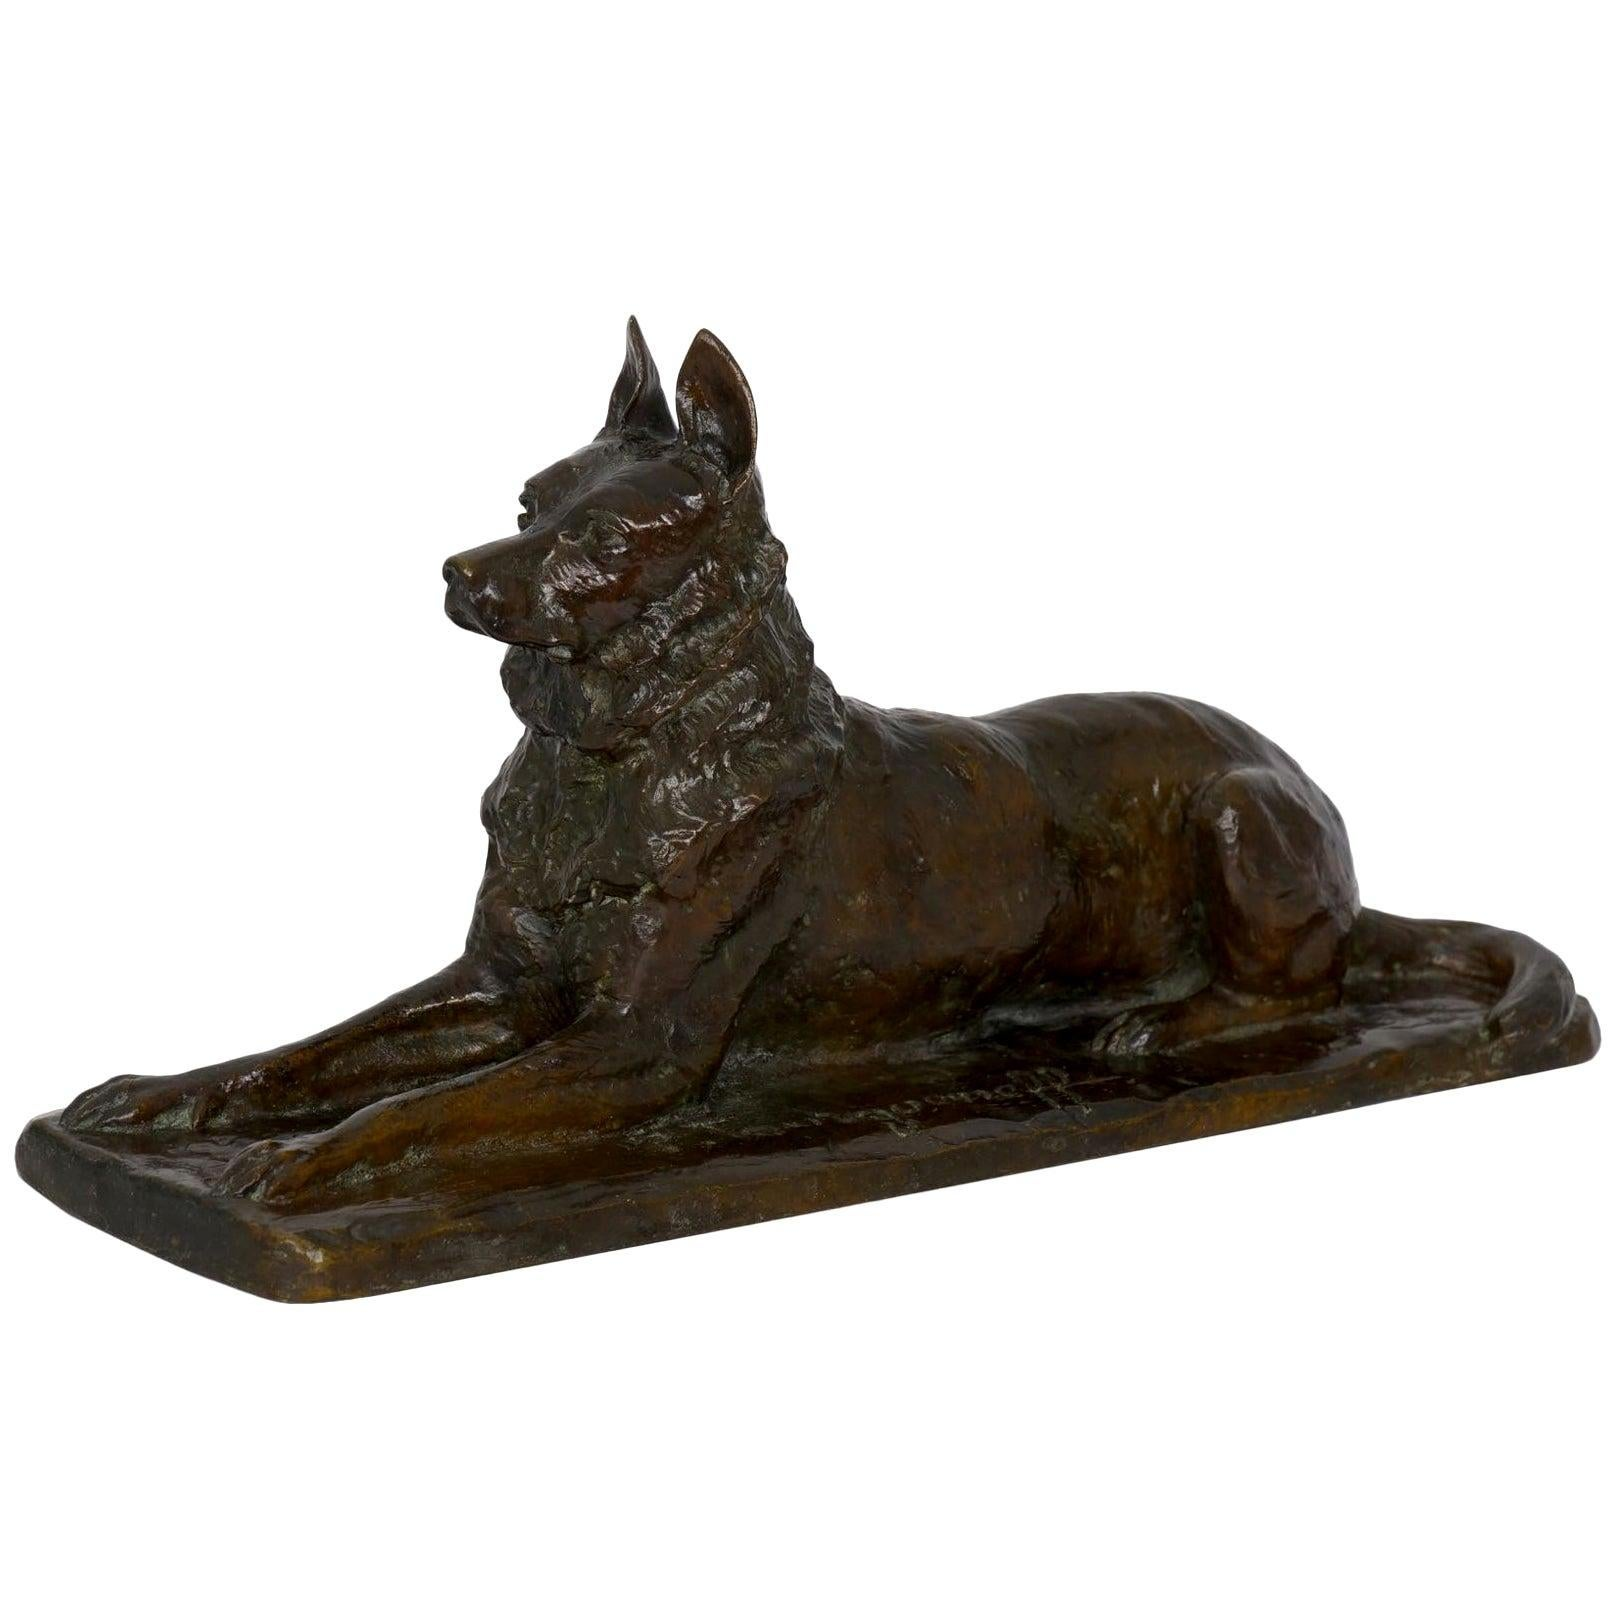 """German Shepherd"" Antique French Bronze Sculpture Dog by P. Tourgueneff & Susse"